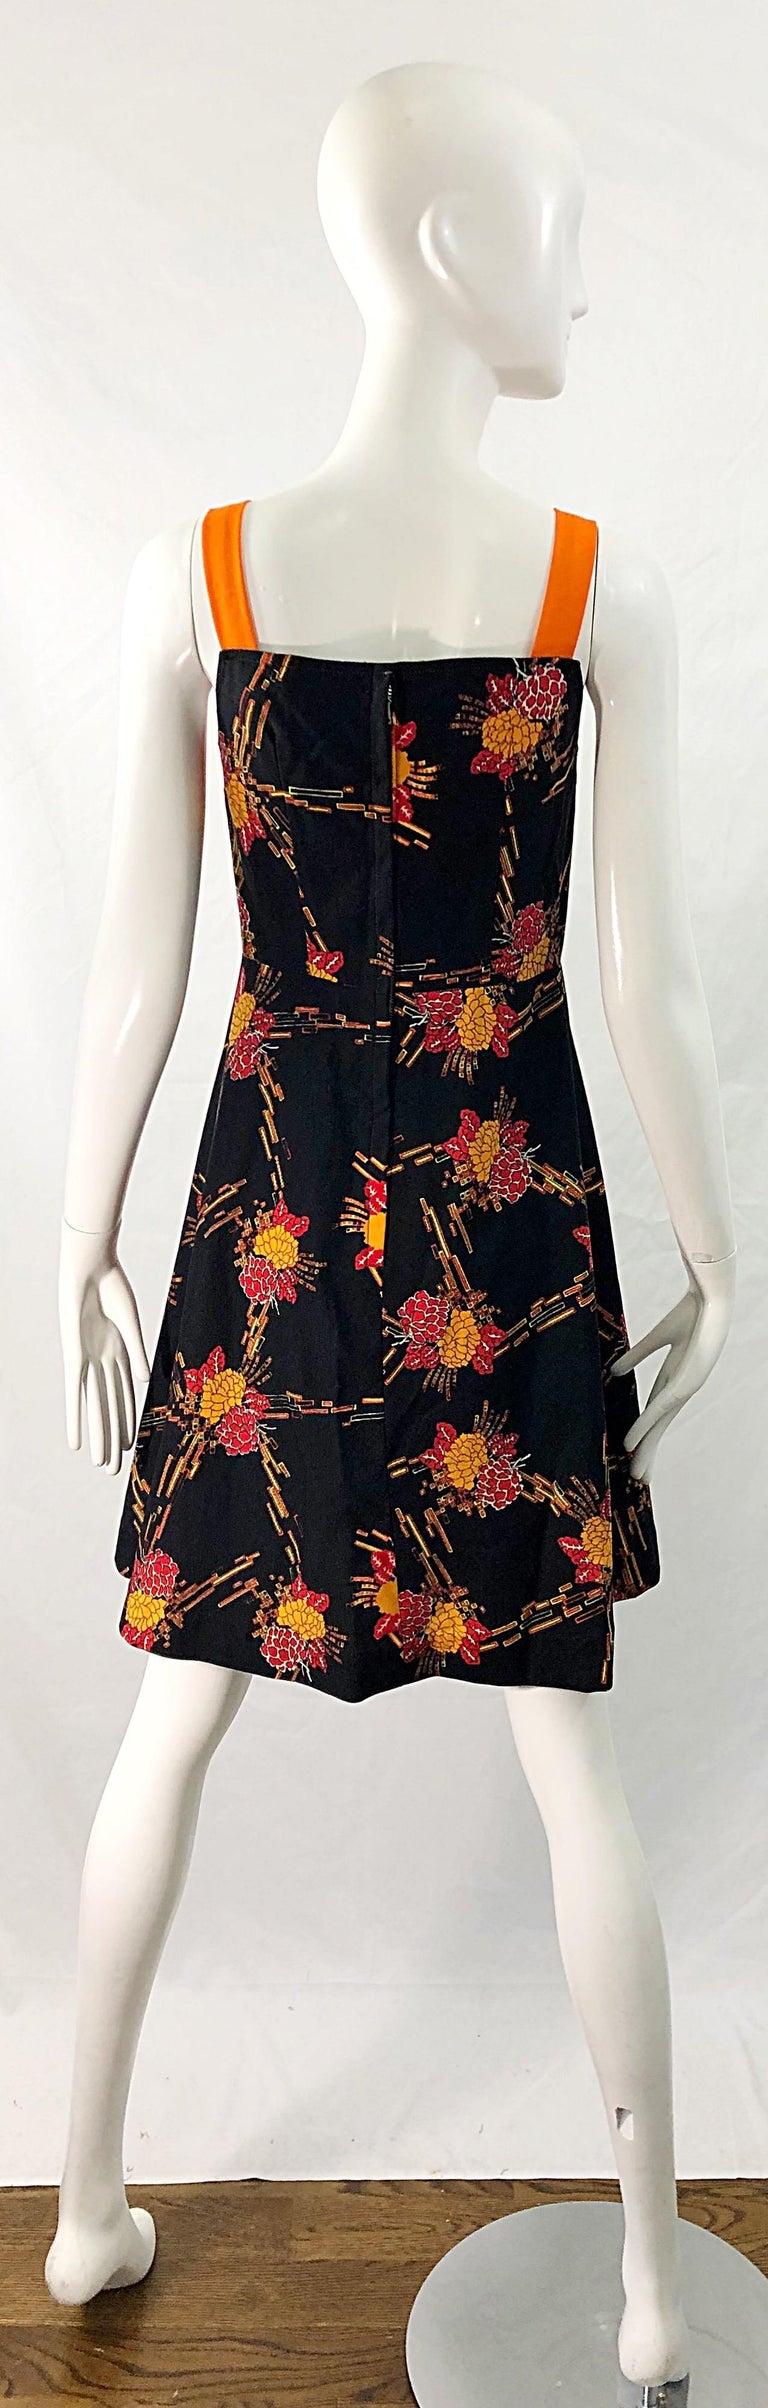 1970s Autumnal Digital Floral Print Knit Vintage 70s A Line Dress + Bolero Top For Sale 5